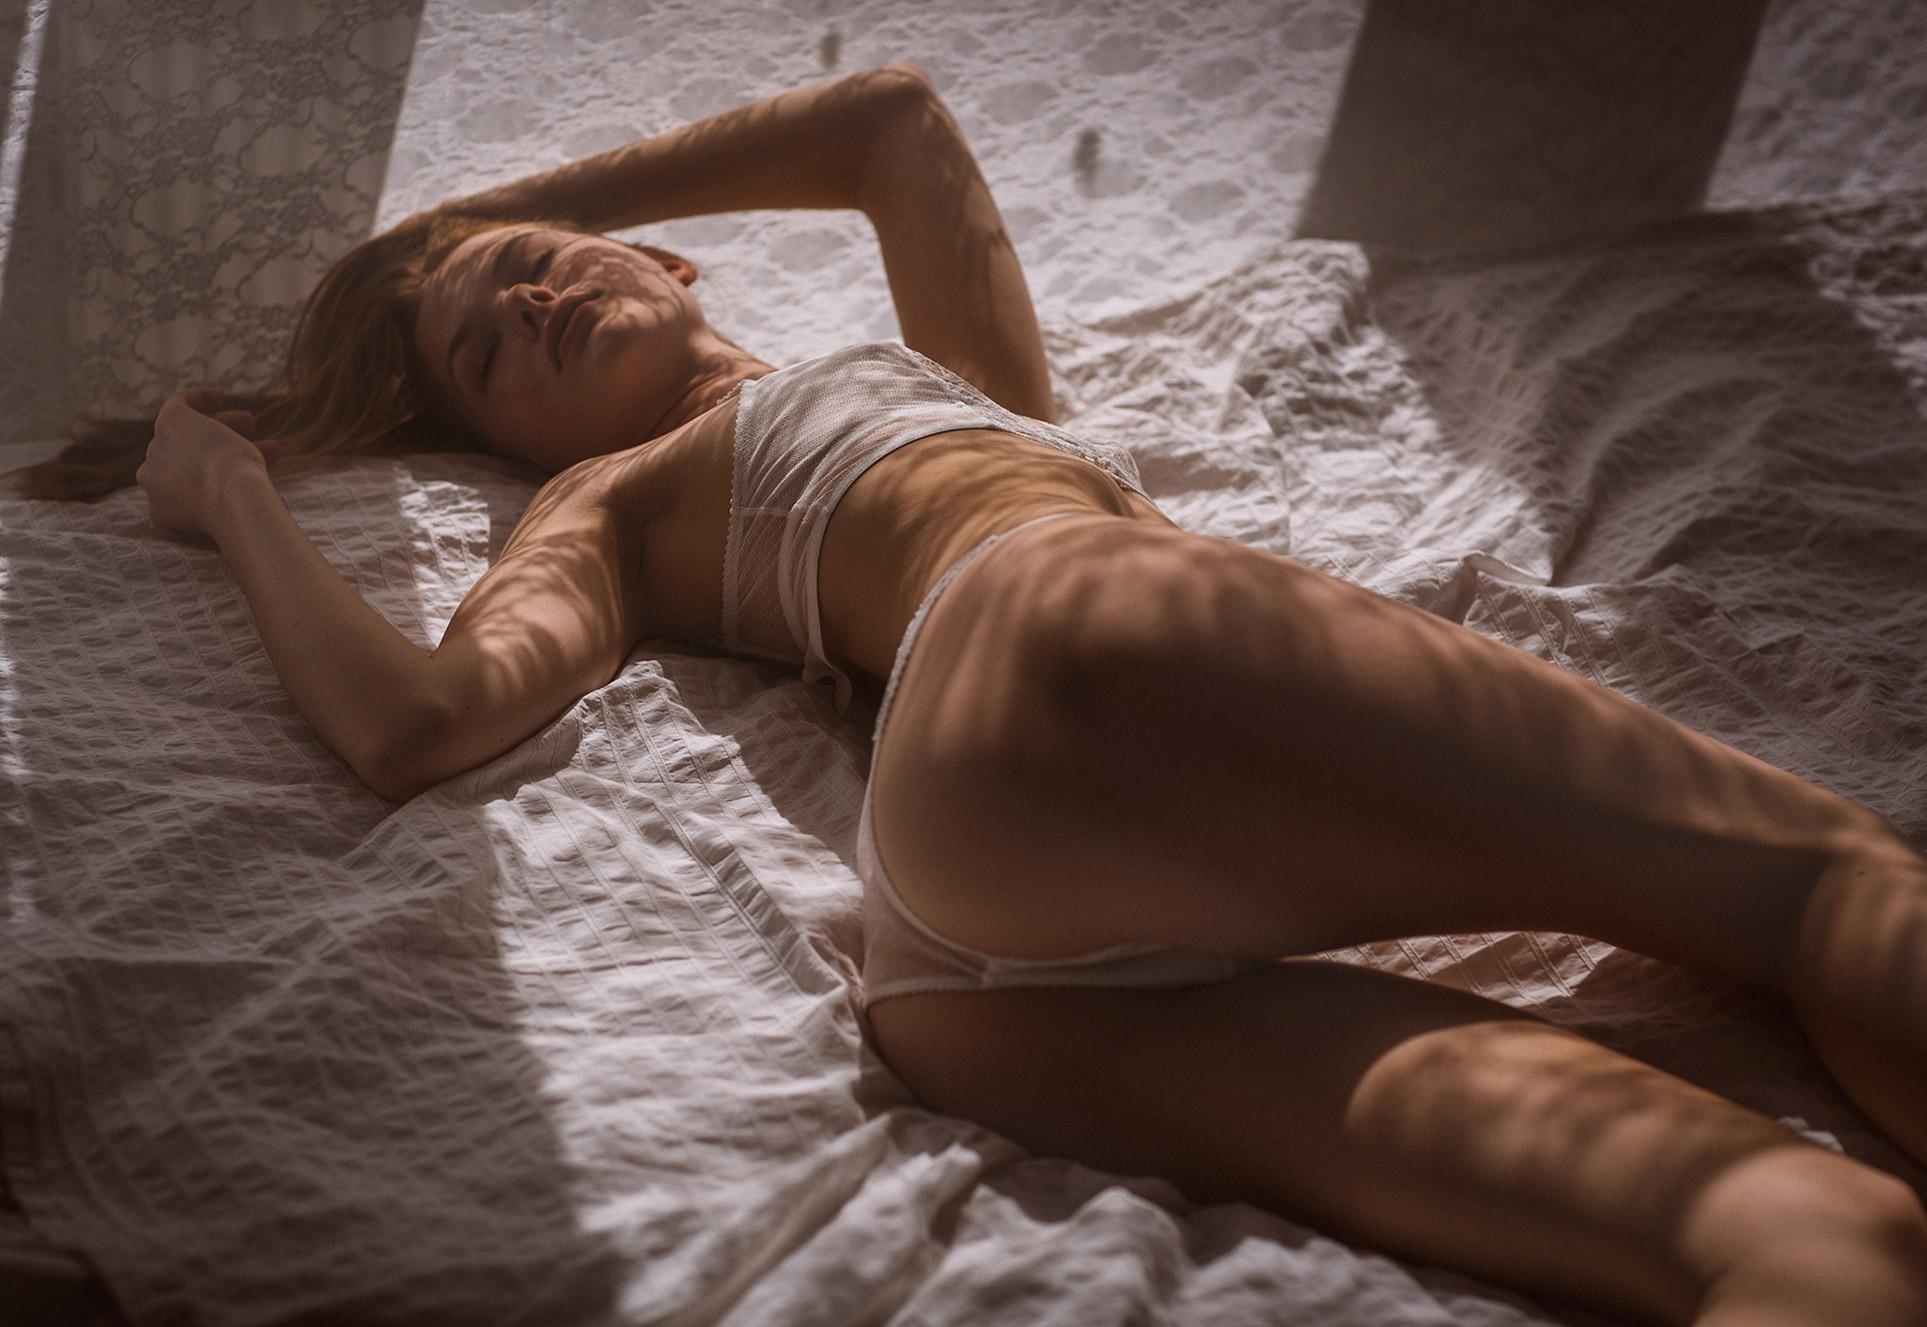 Anna Levsen in sexy lingerie by Thomas Agatz